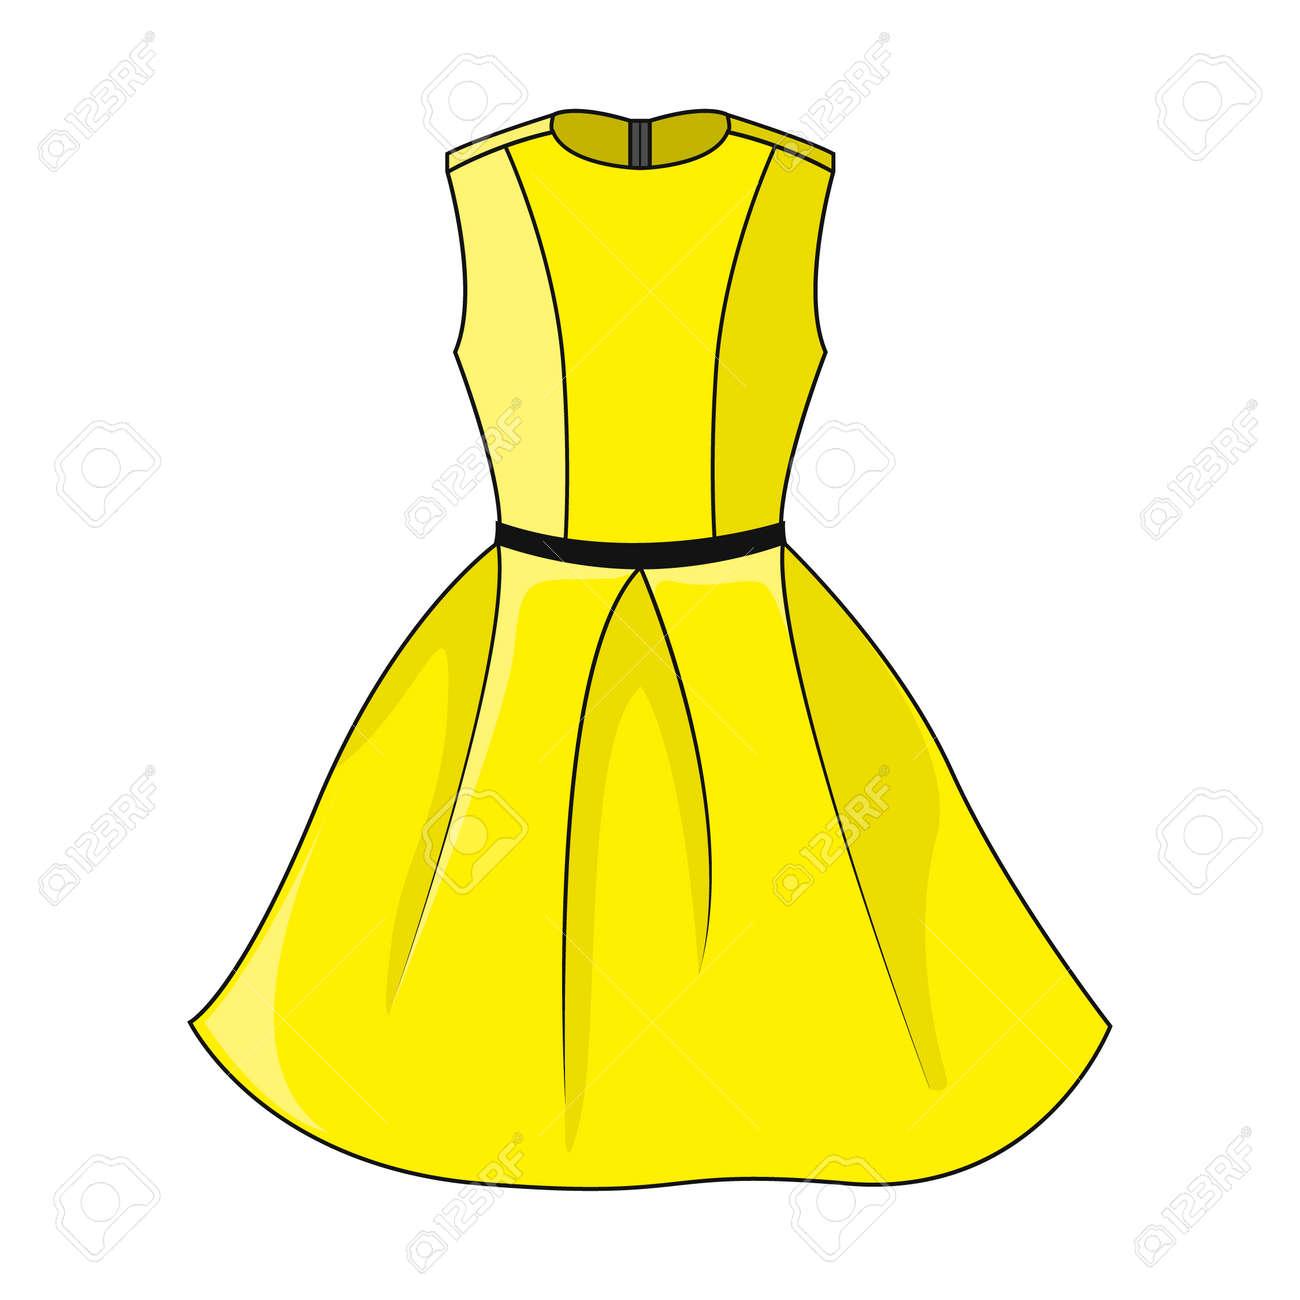 Elegant yellow dress icon  Beautiful short yellow dress with